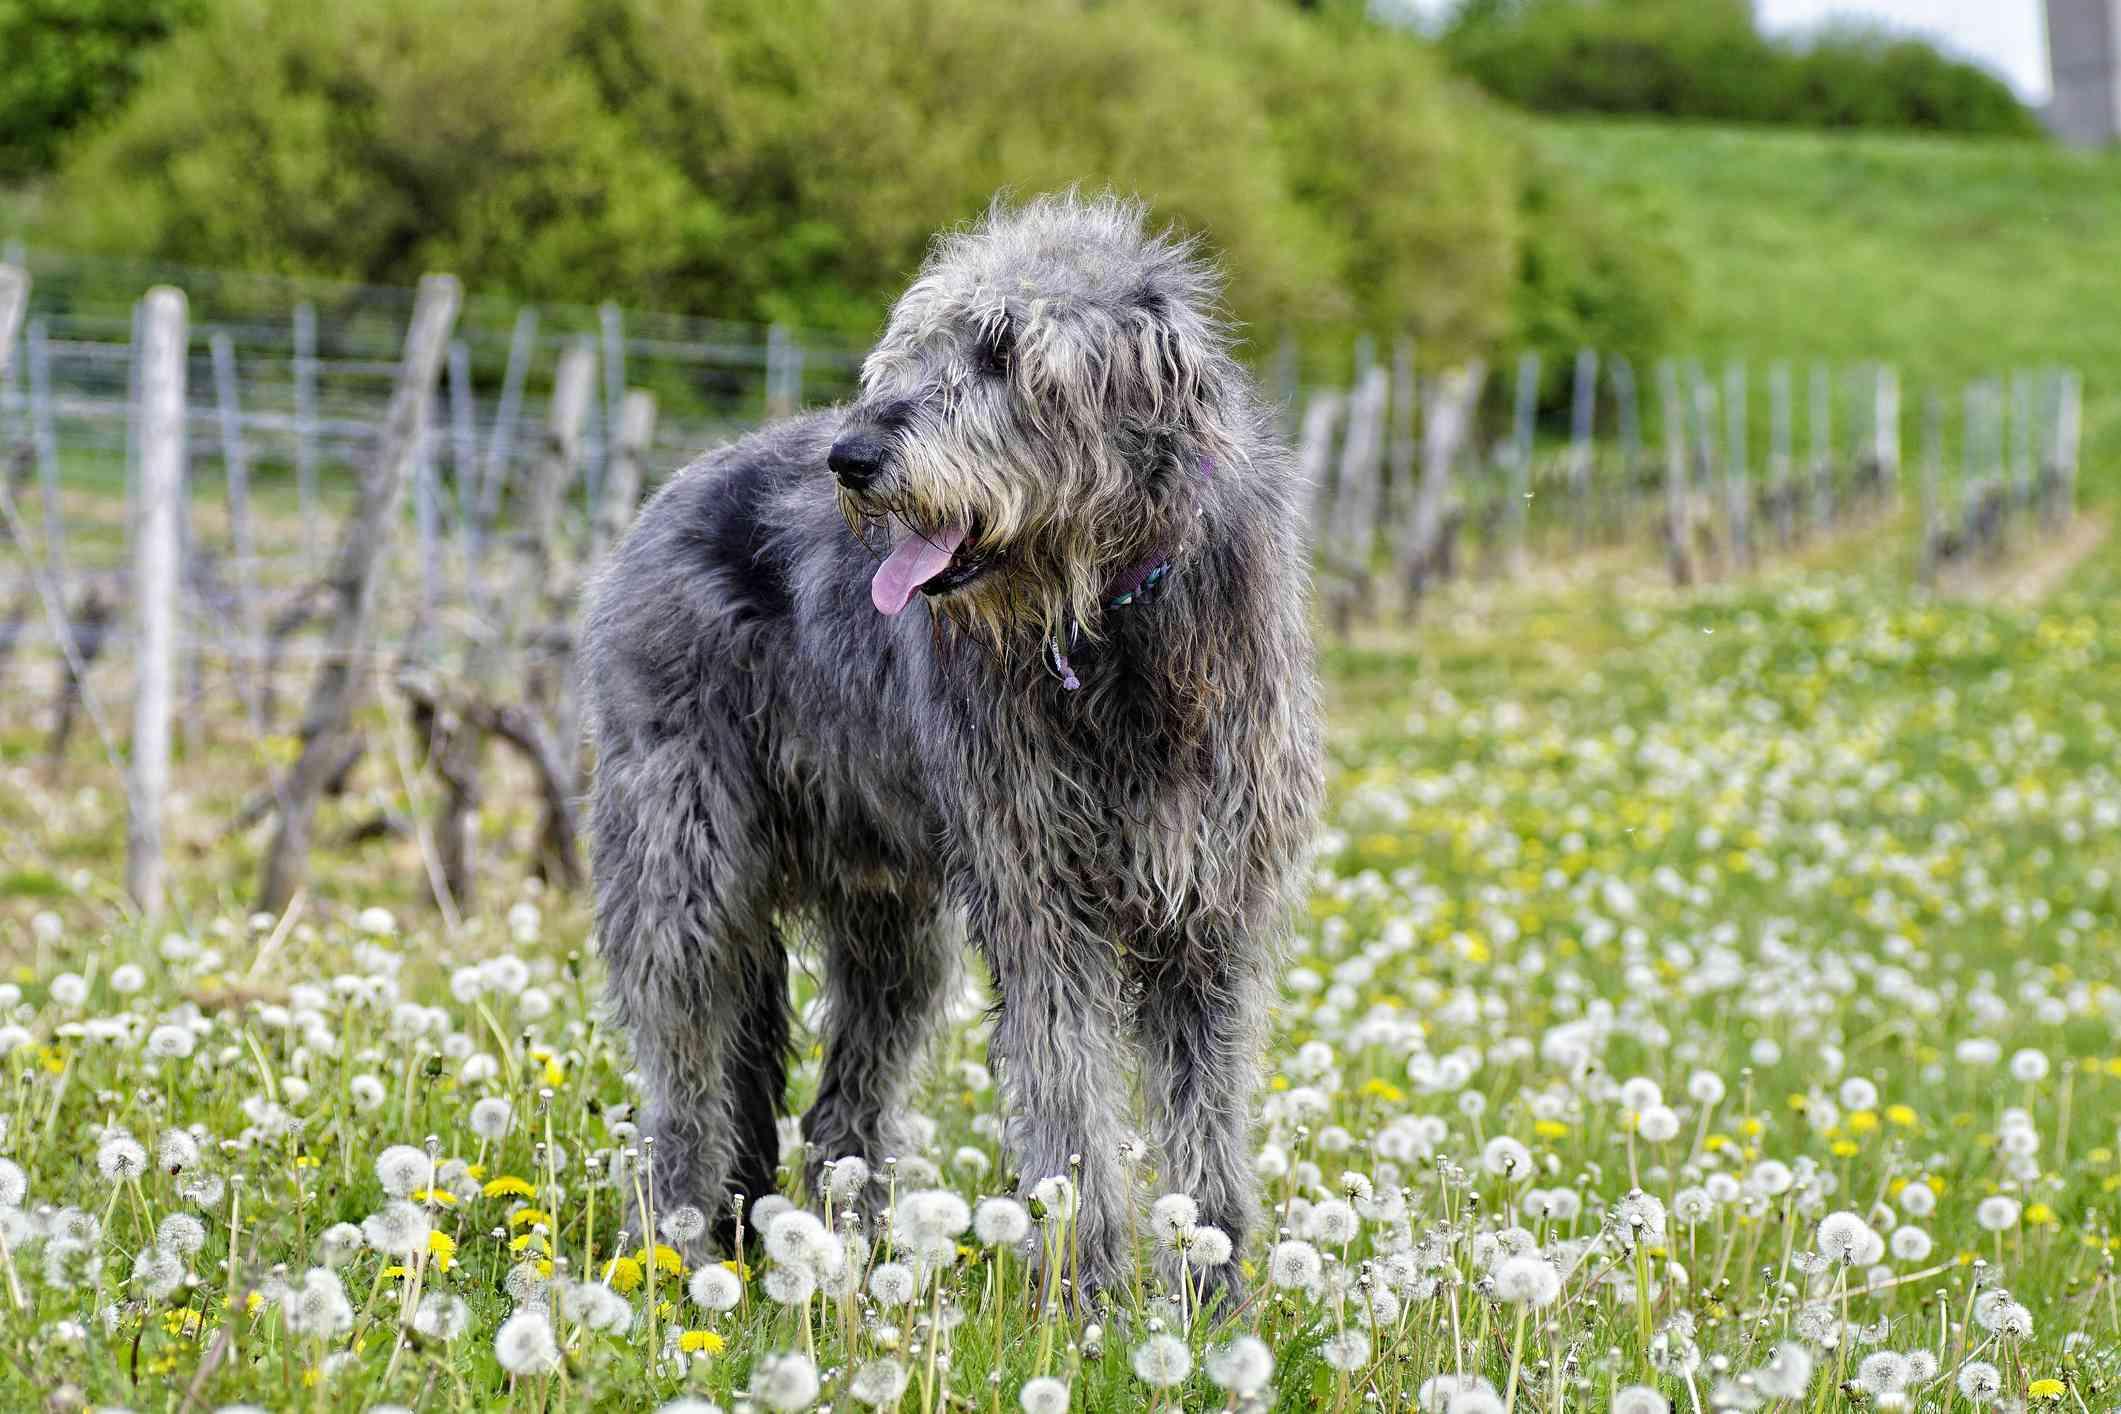 Blue Irish wolfhound